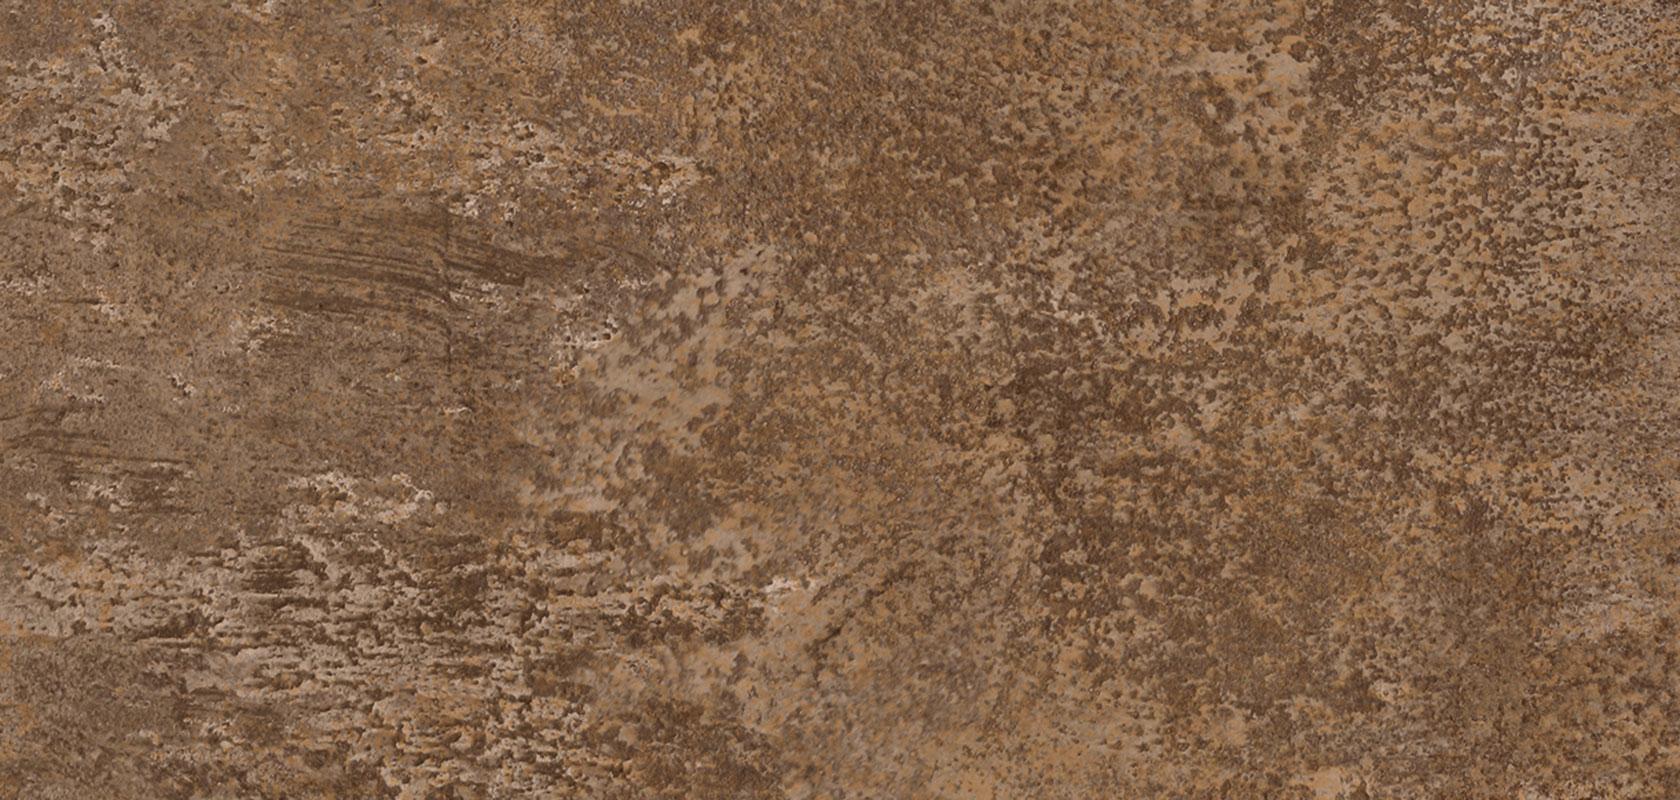 355 Ferro bronze décor